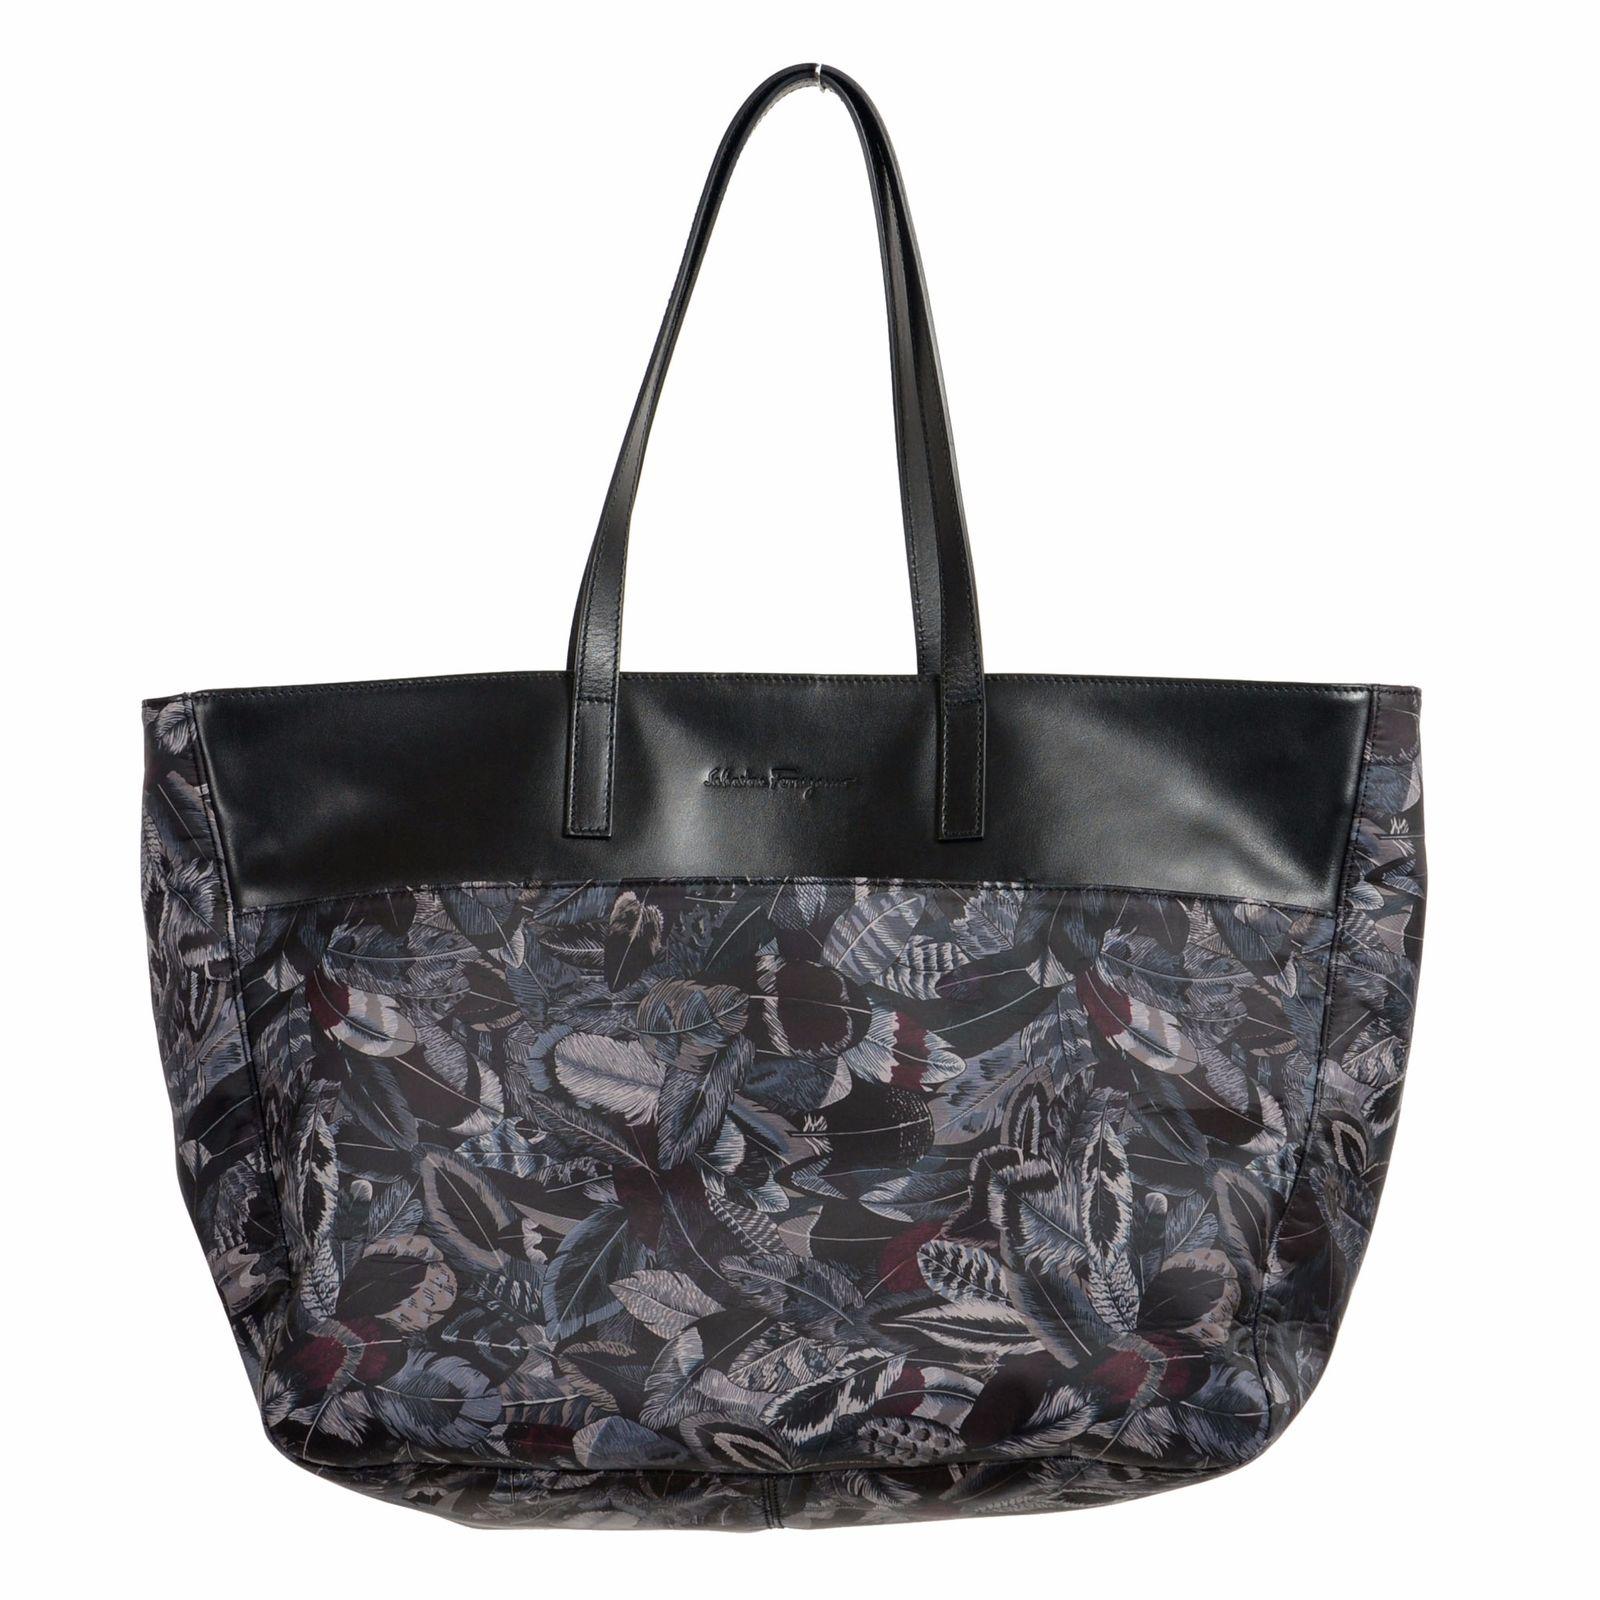 Salvatore Ferragamo Multi-Color Calf Leather Trim Women s Handbag Shoulder  Bag 0 ded2ca9f26